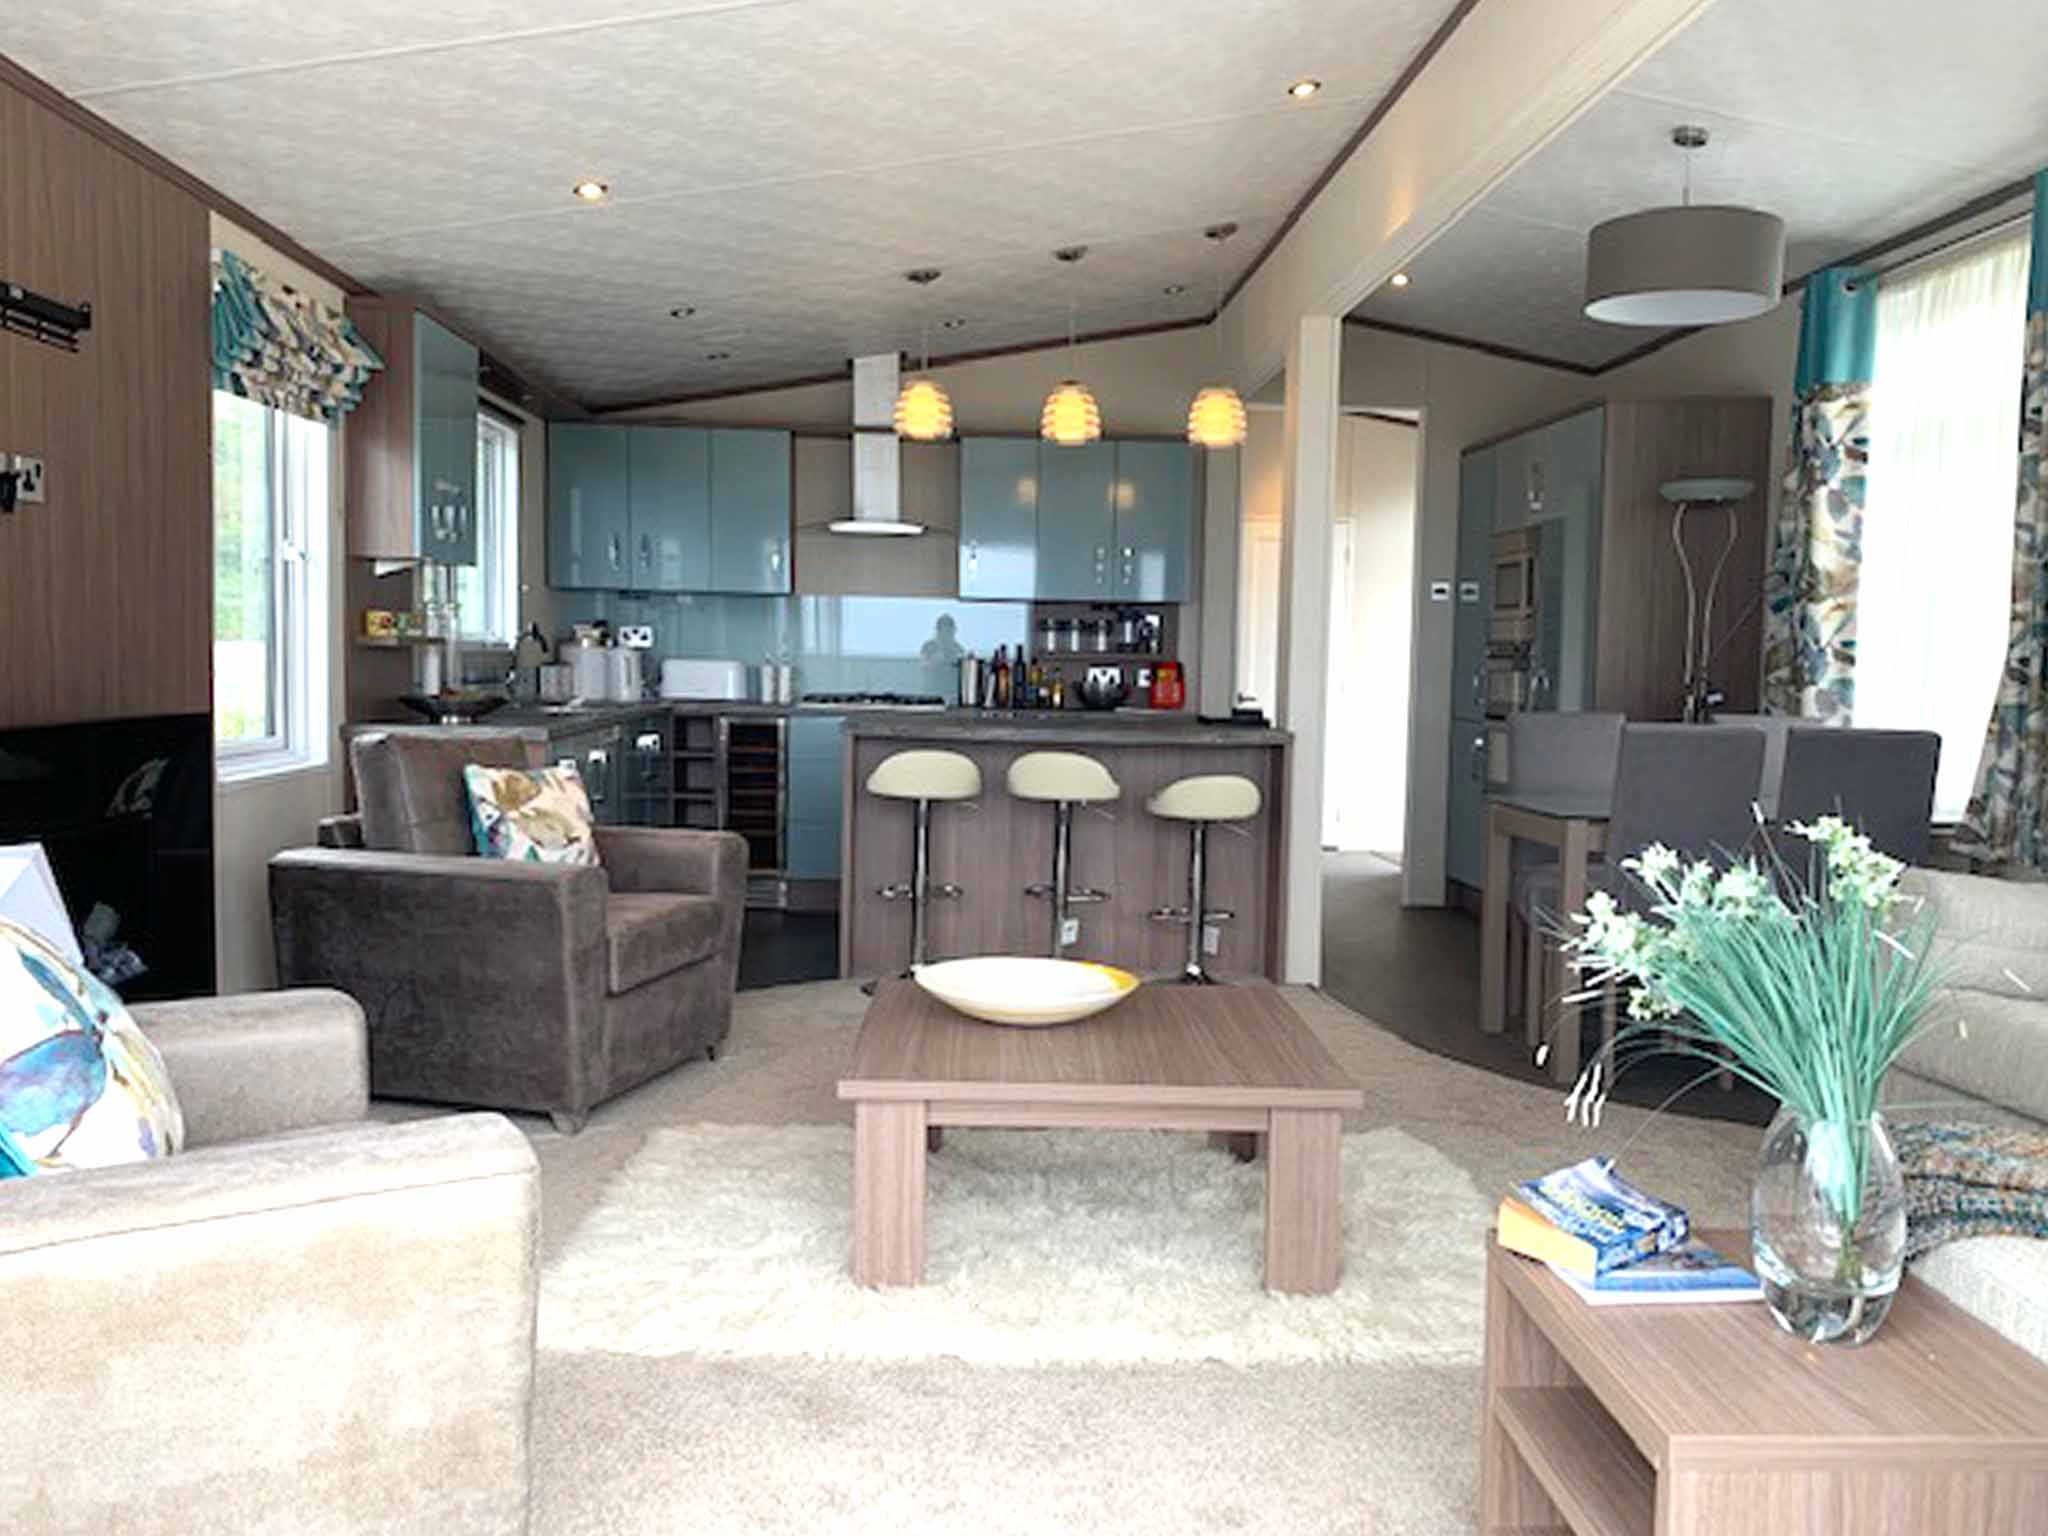 Pemberton Arrondale lodge living room kitchen open plan Gwalia Falls Retreat Tresaith Beach